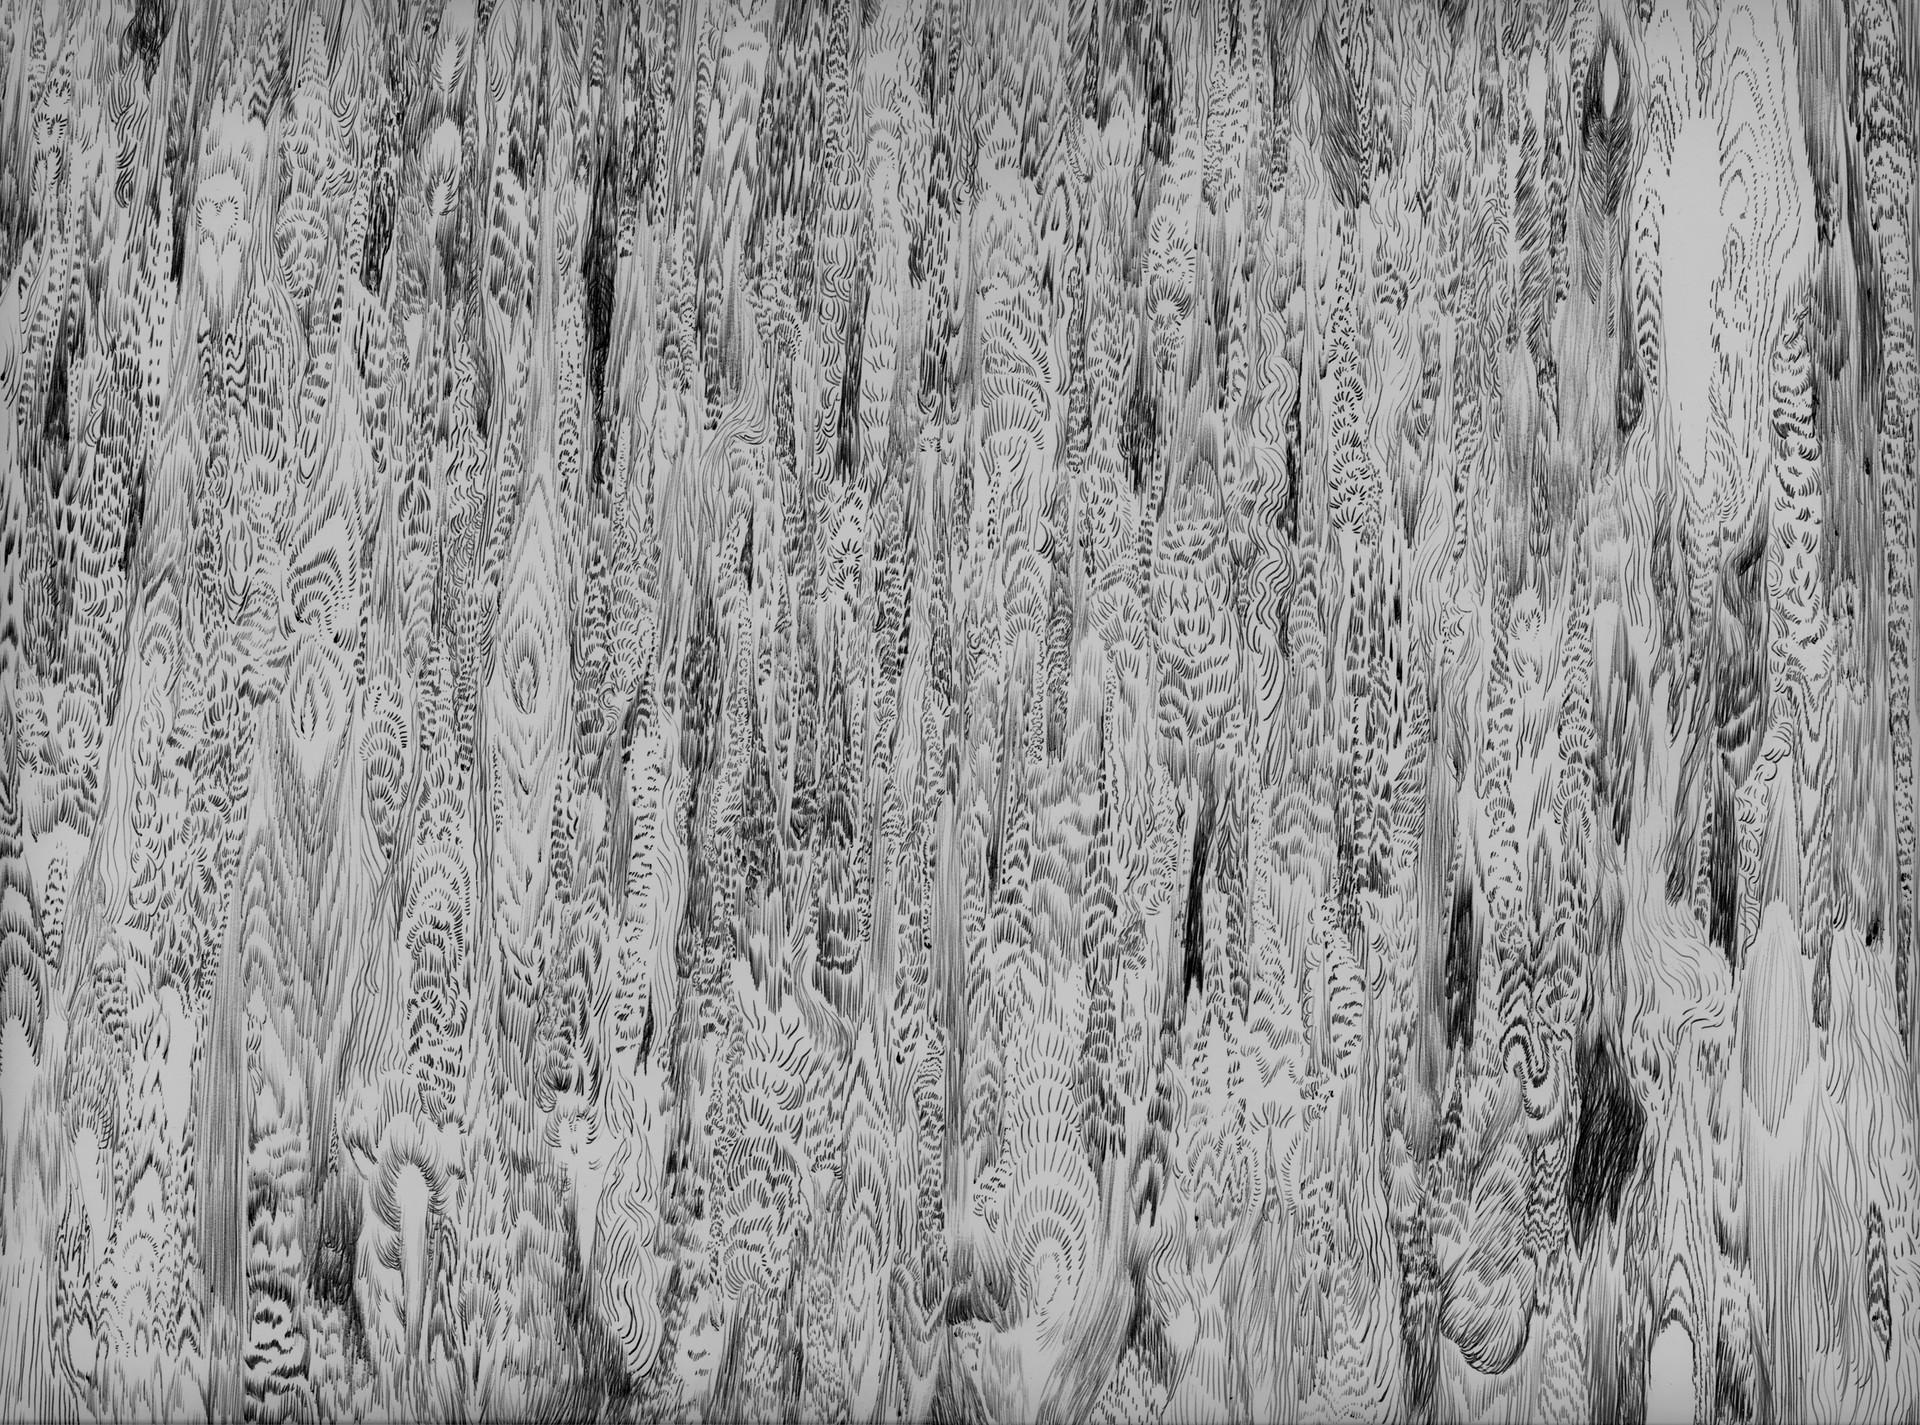 aeternal fingalian forest